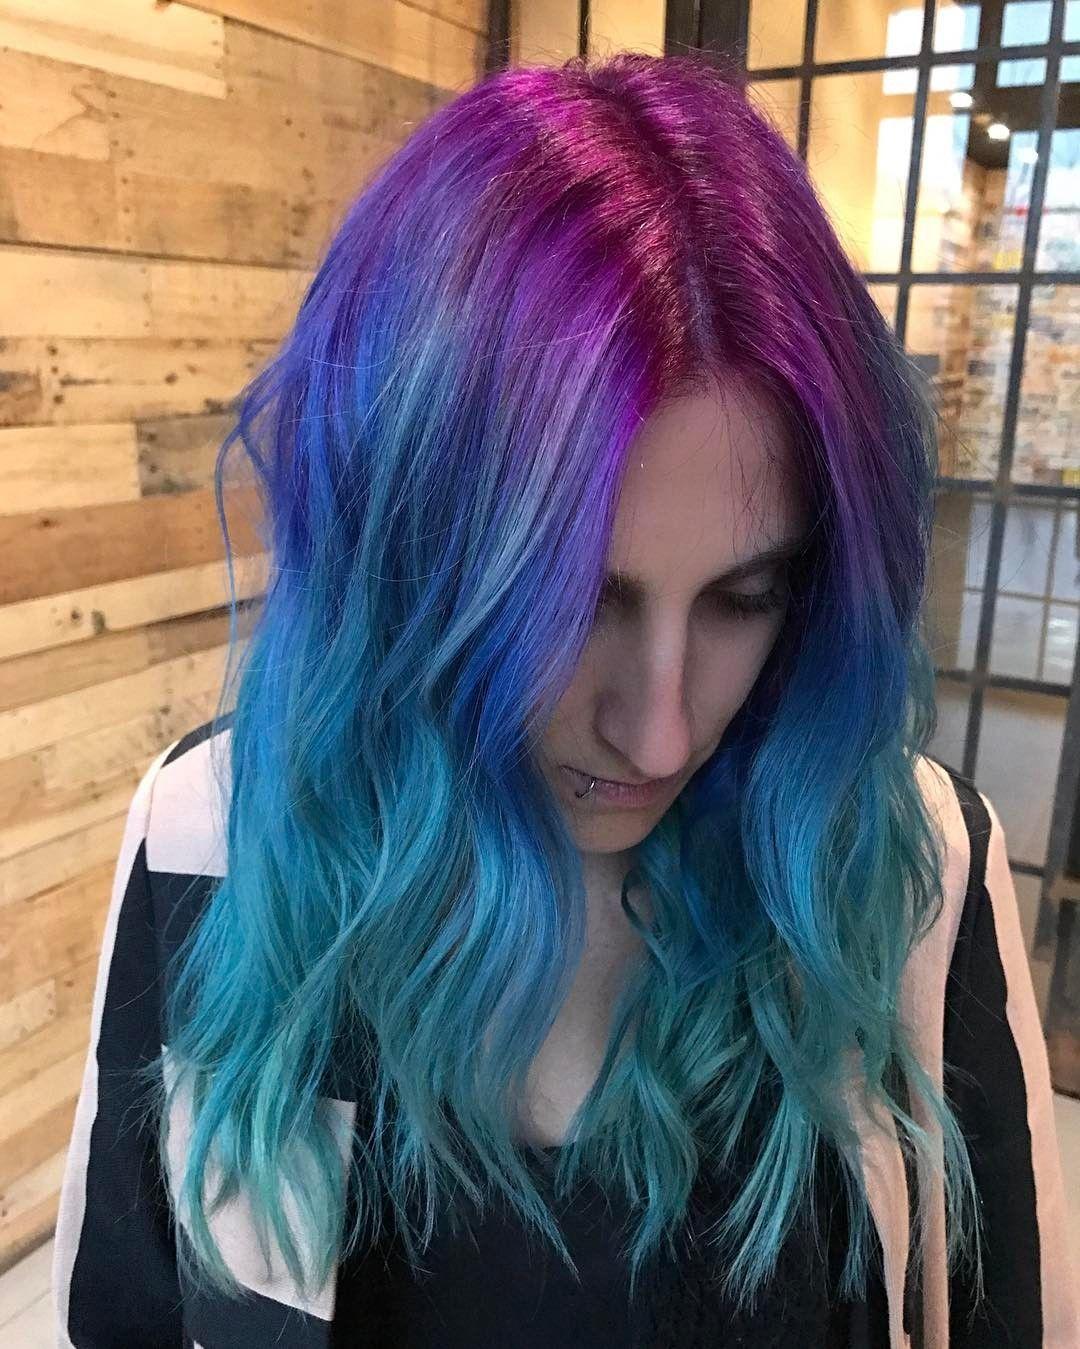 Hannahthepainter cool things pinterest hair coloring